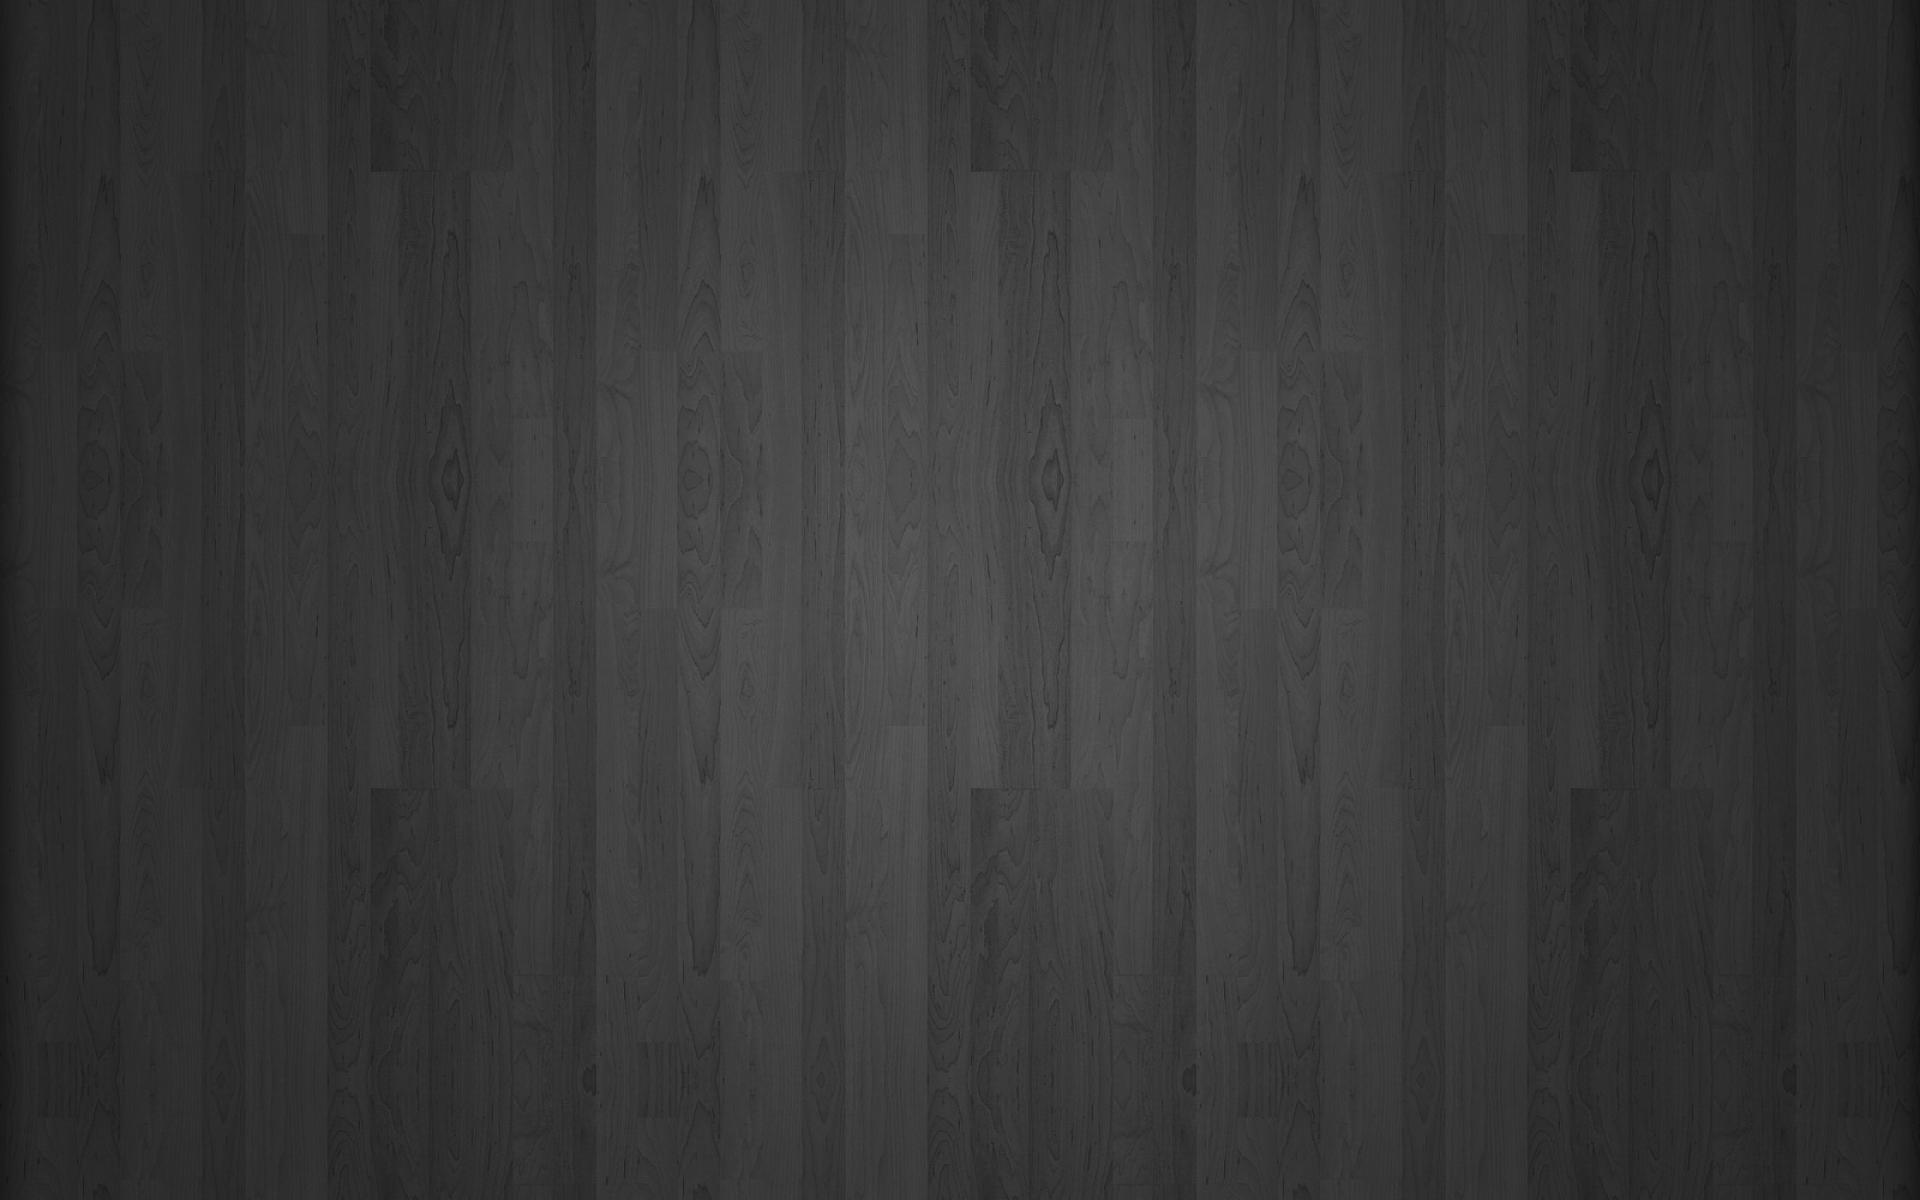 Wood Wallpaper Dark Edition